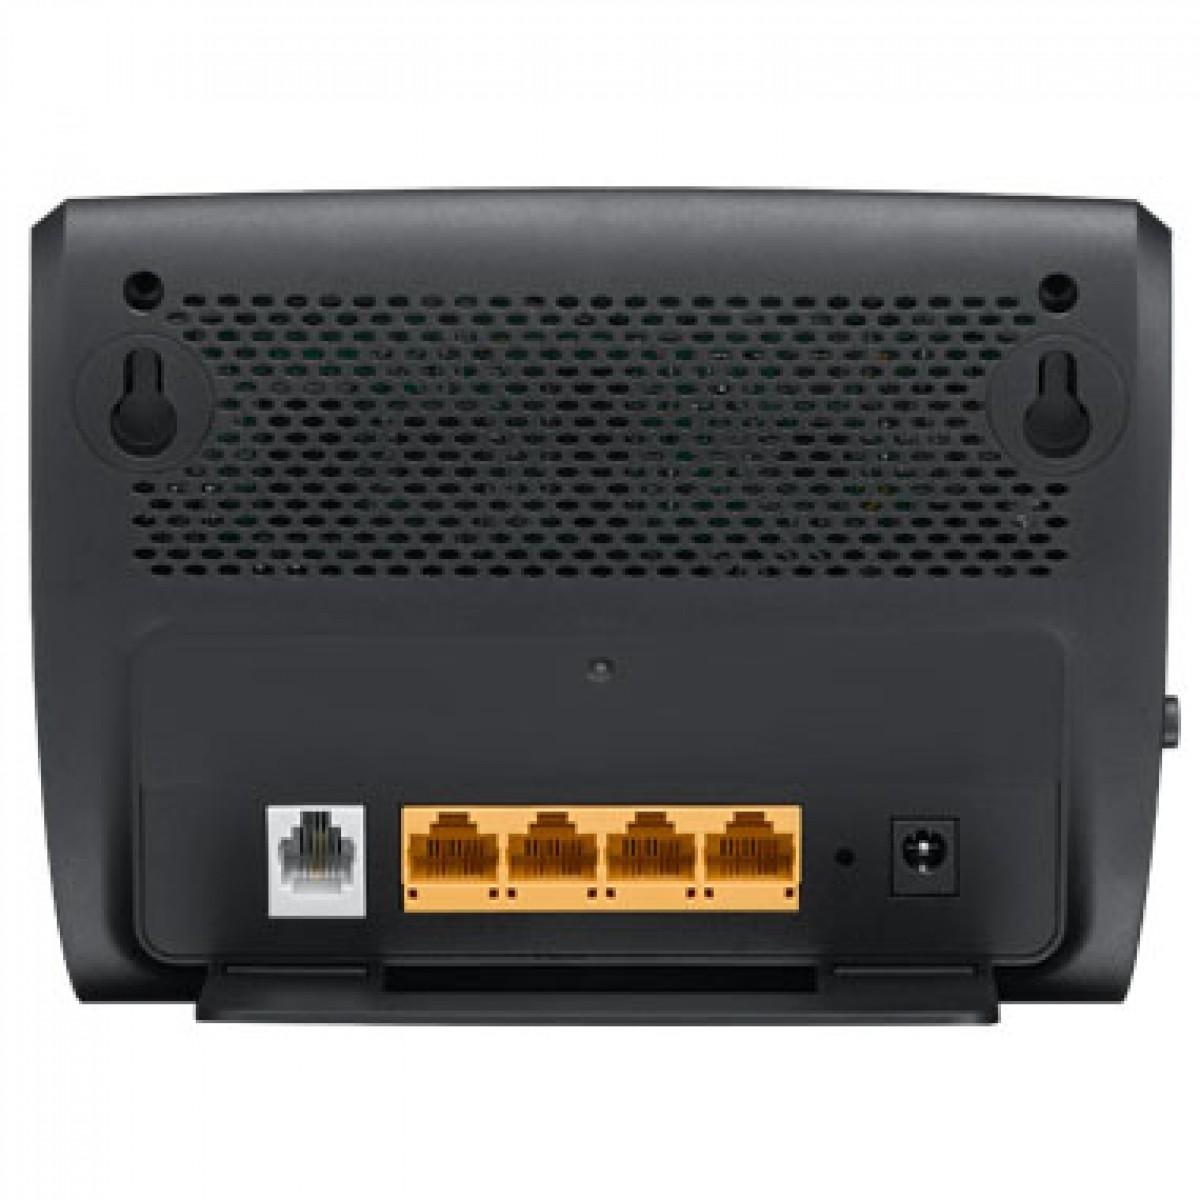 Zyxel Vmg1312 B10d Wireless Router Dsl Modem 4 Port